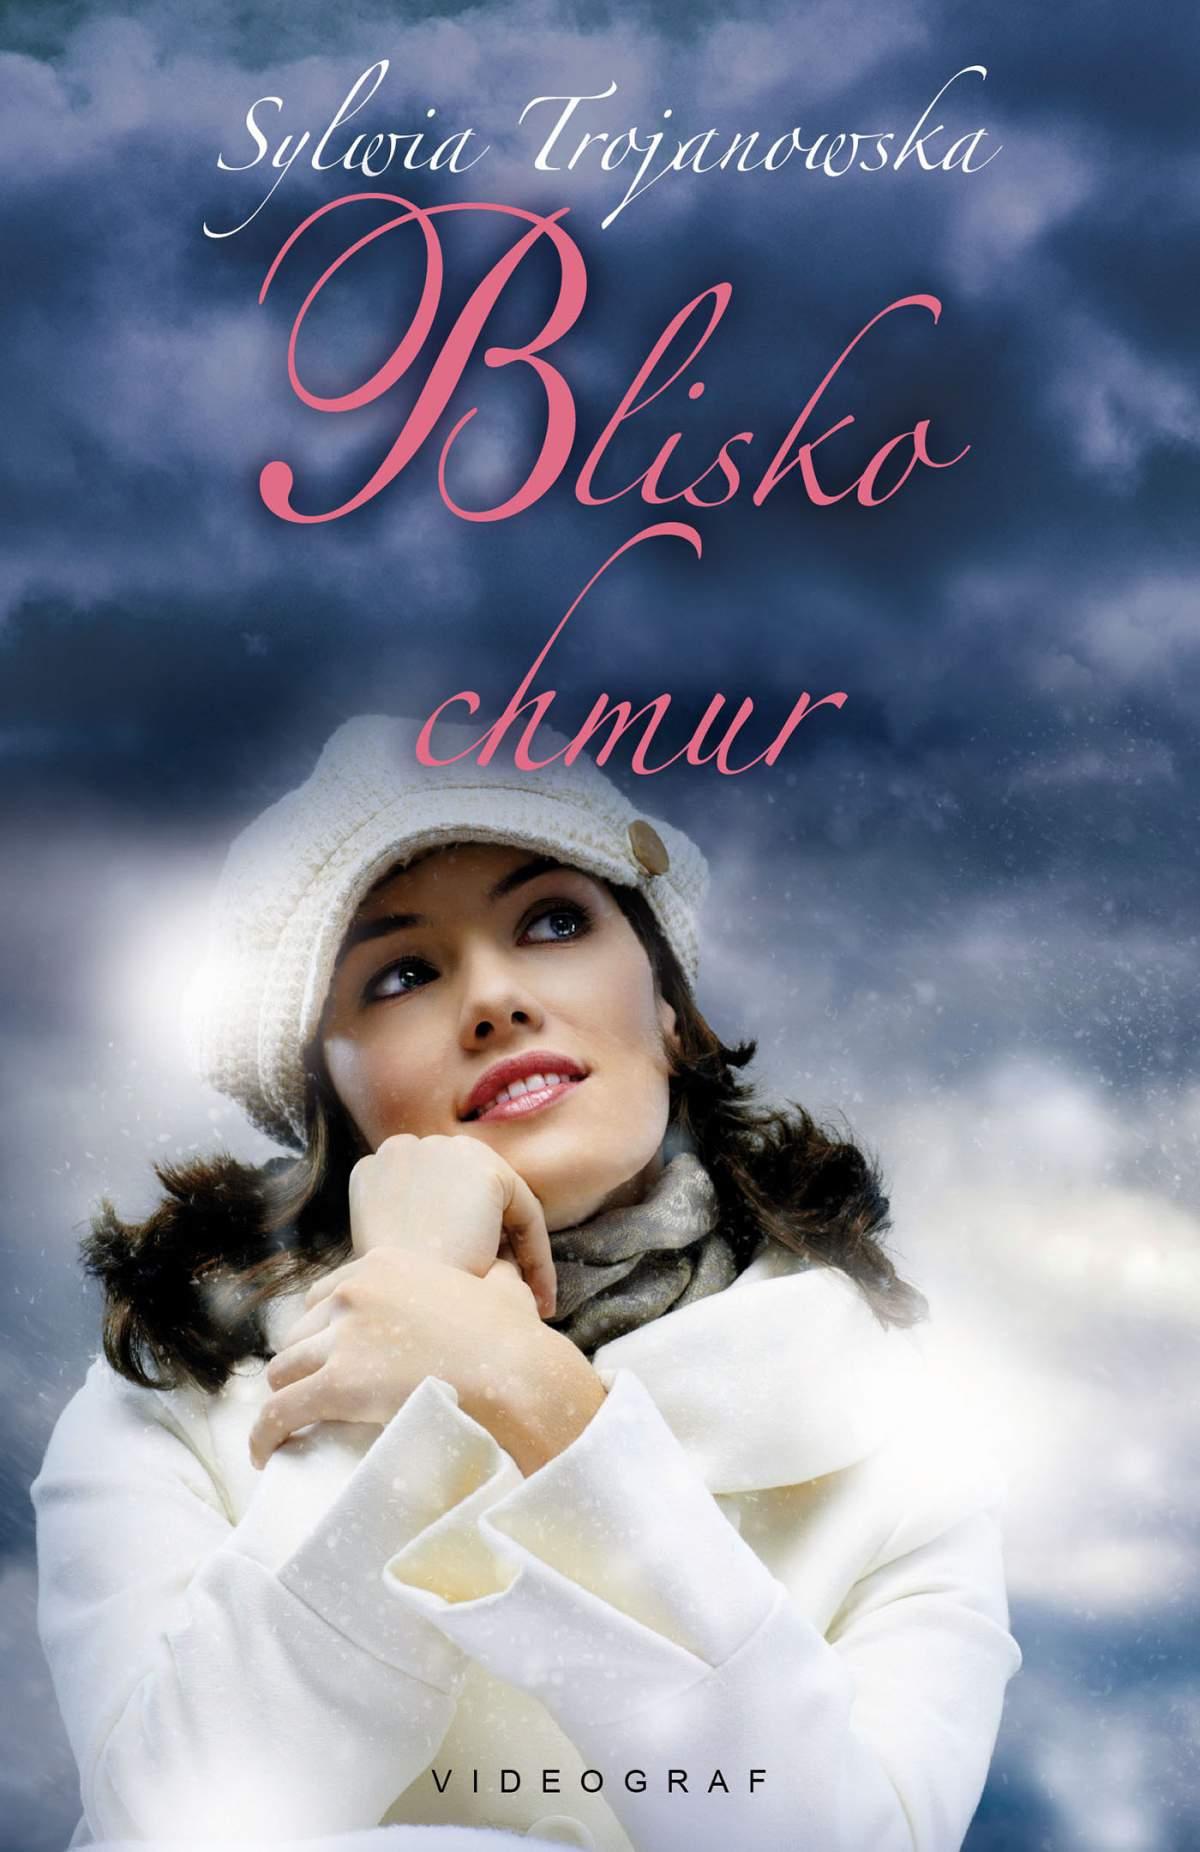 Blisko chmur - Ebook (Książka EPUB) do pobrania w formacie EPUB